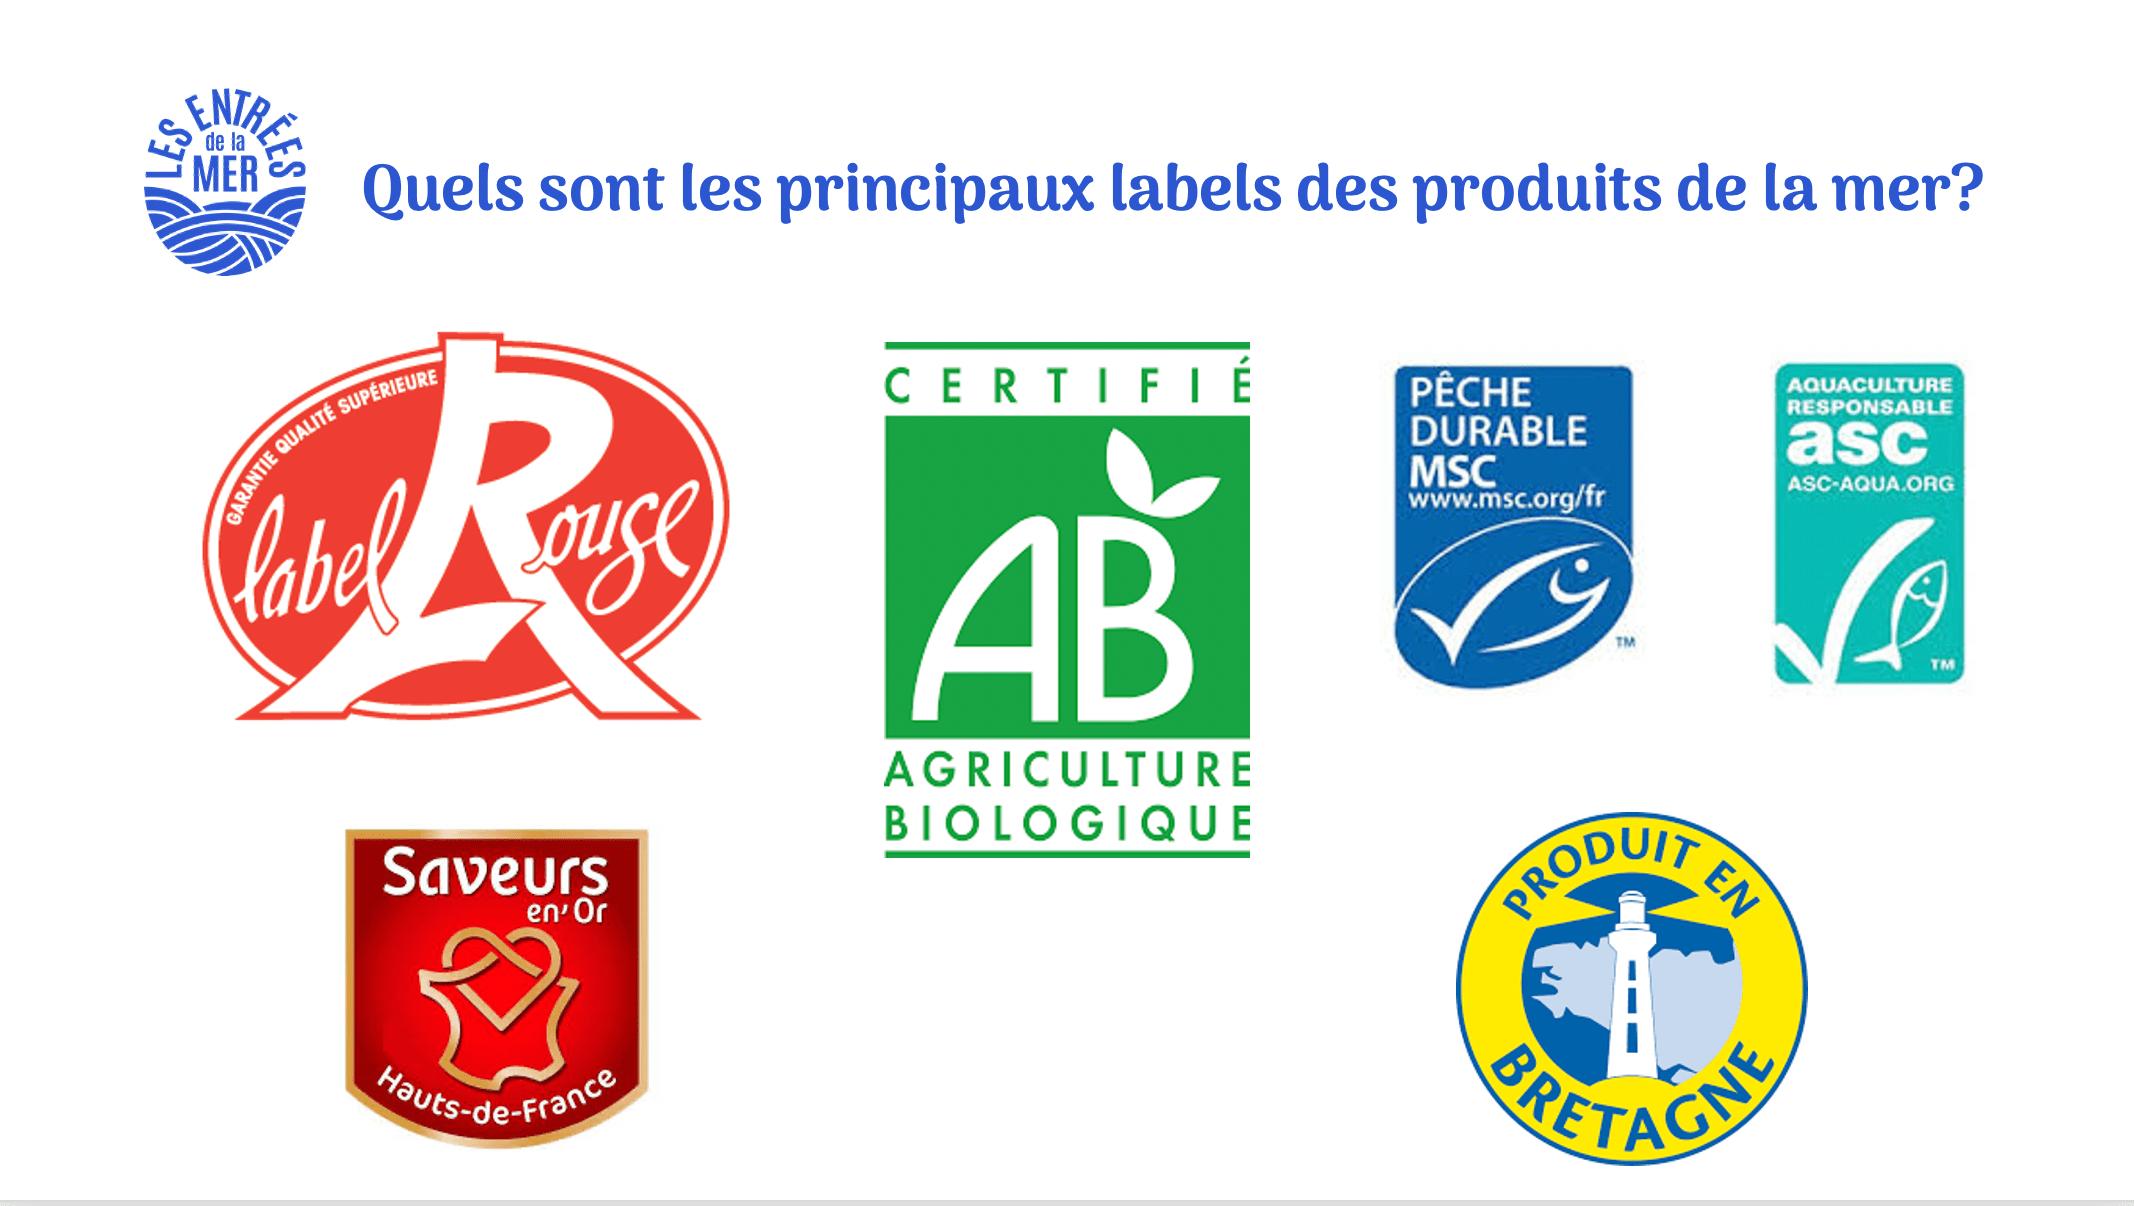 Labels produits de la mer, traiteur de la mer | Les Entrées de la Mer